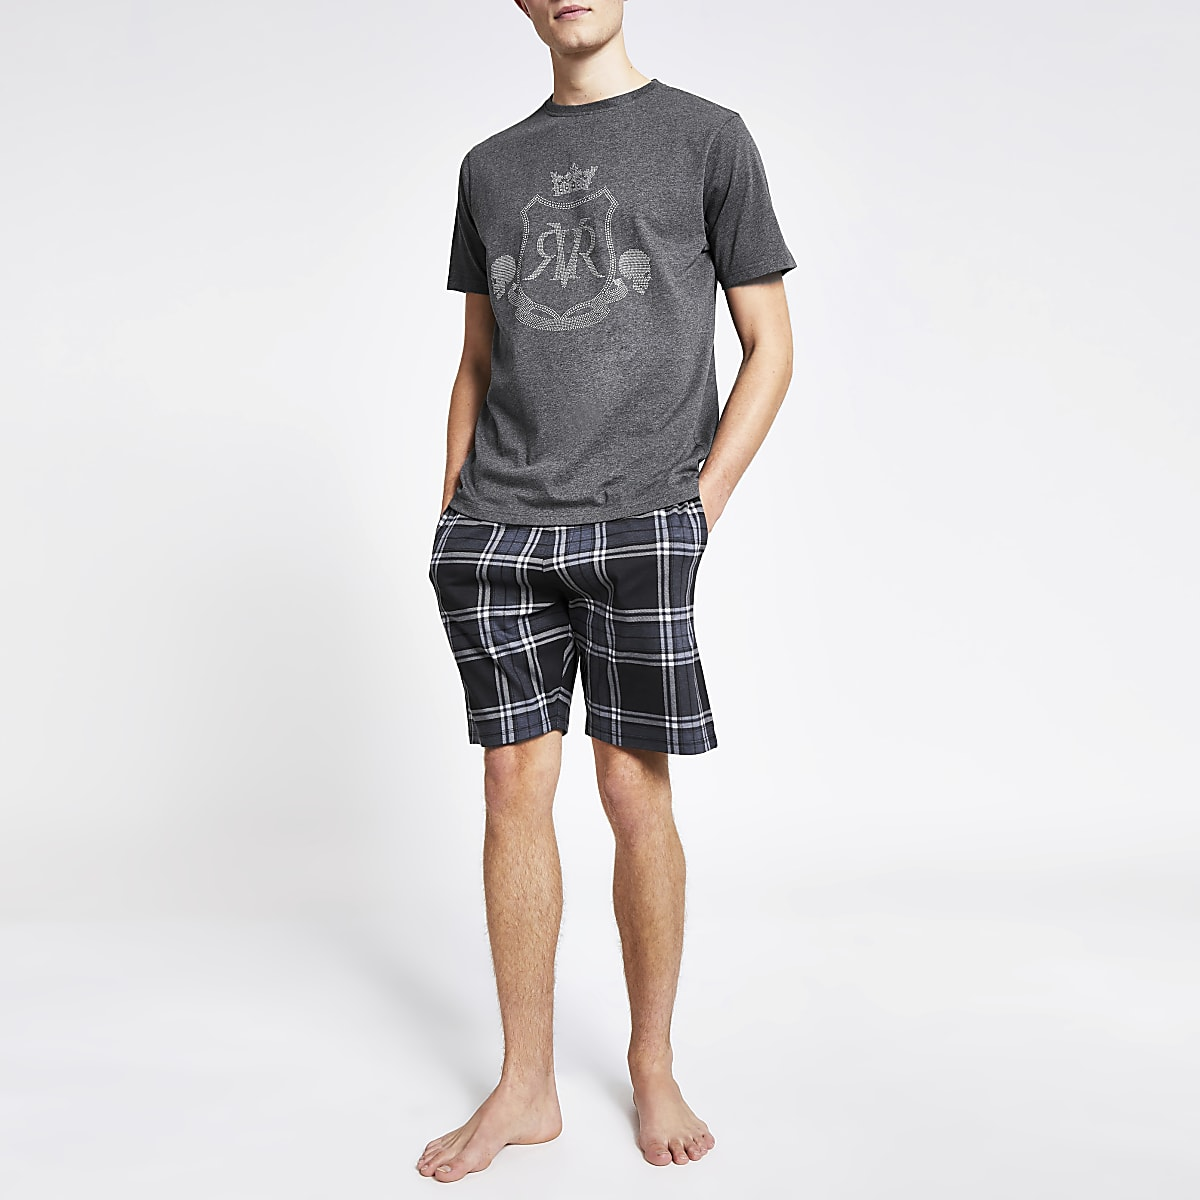 Grey RVR printed short pyjama set